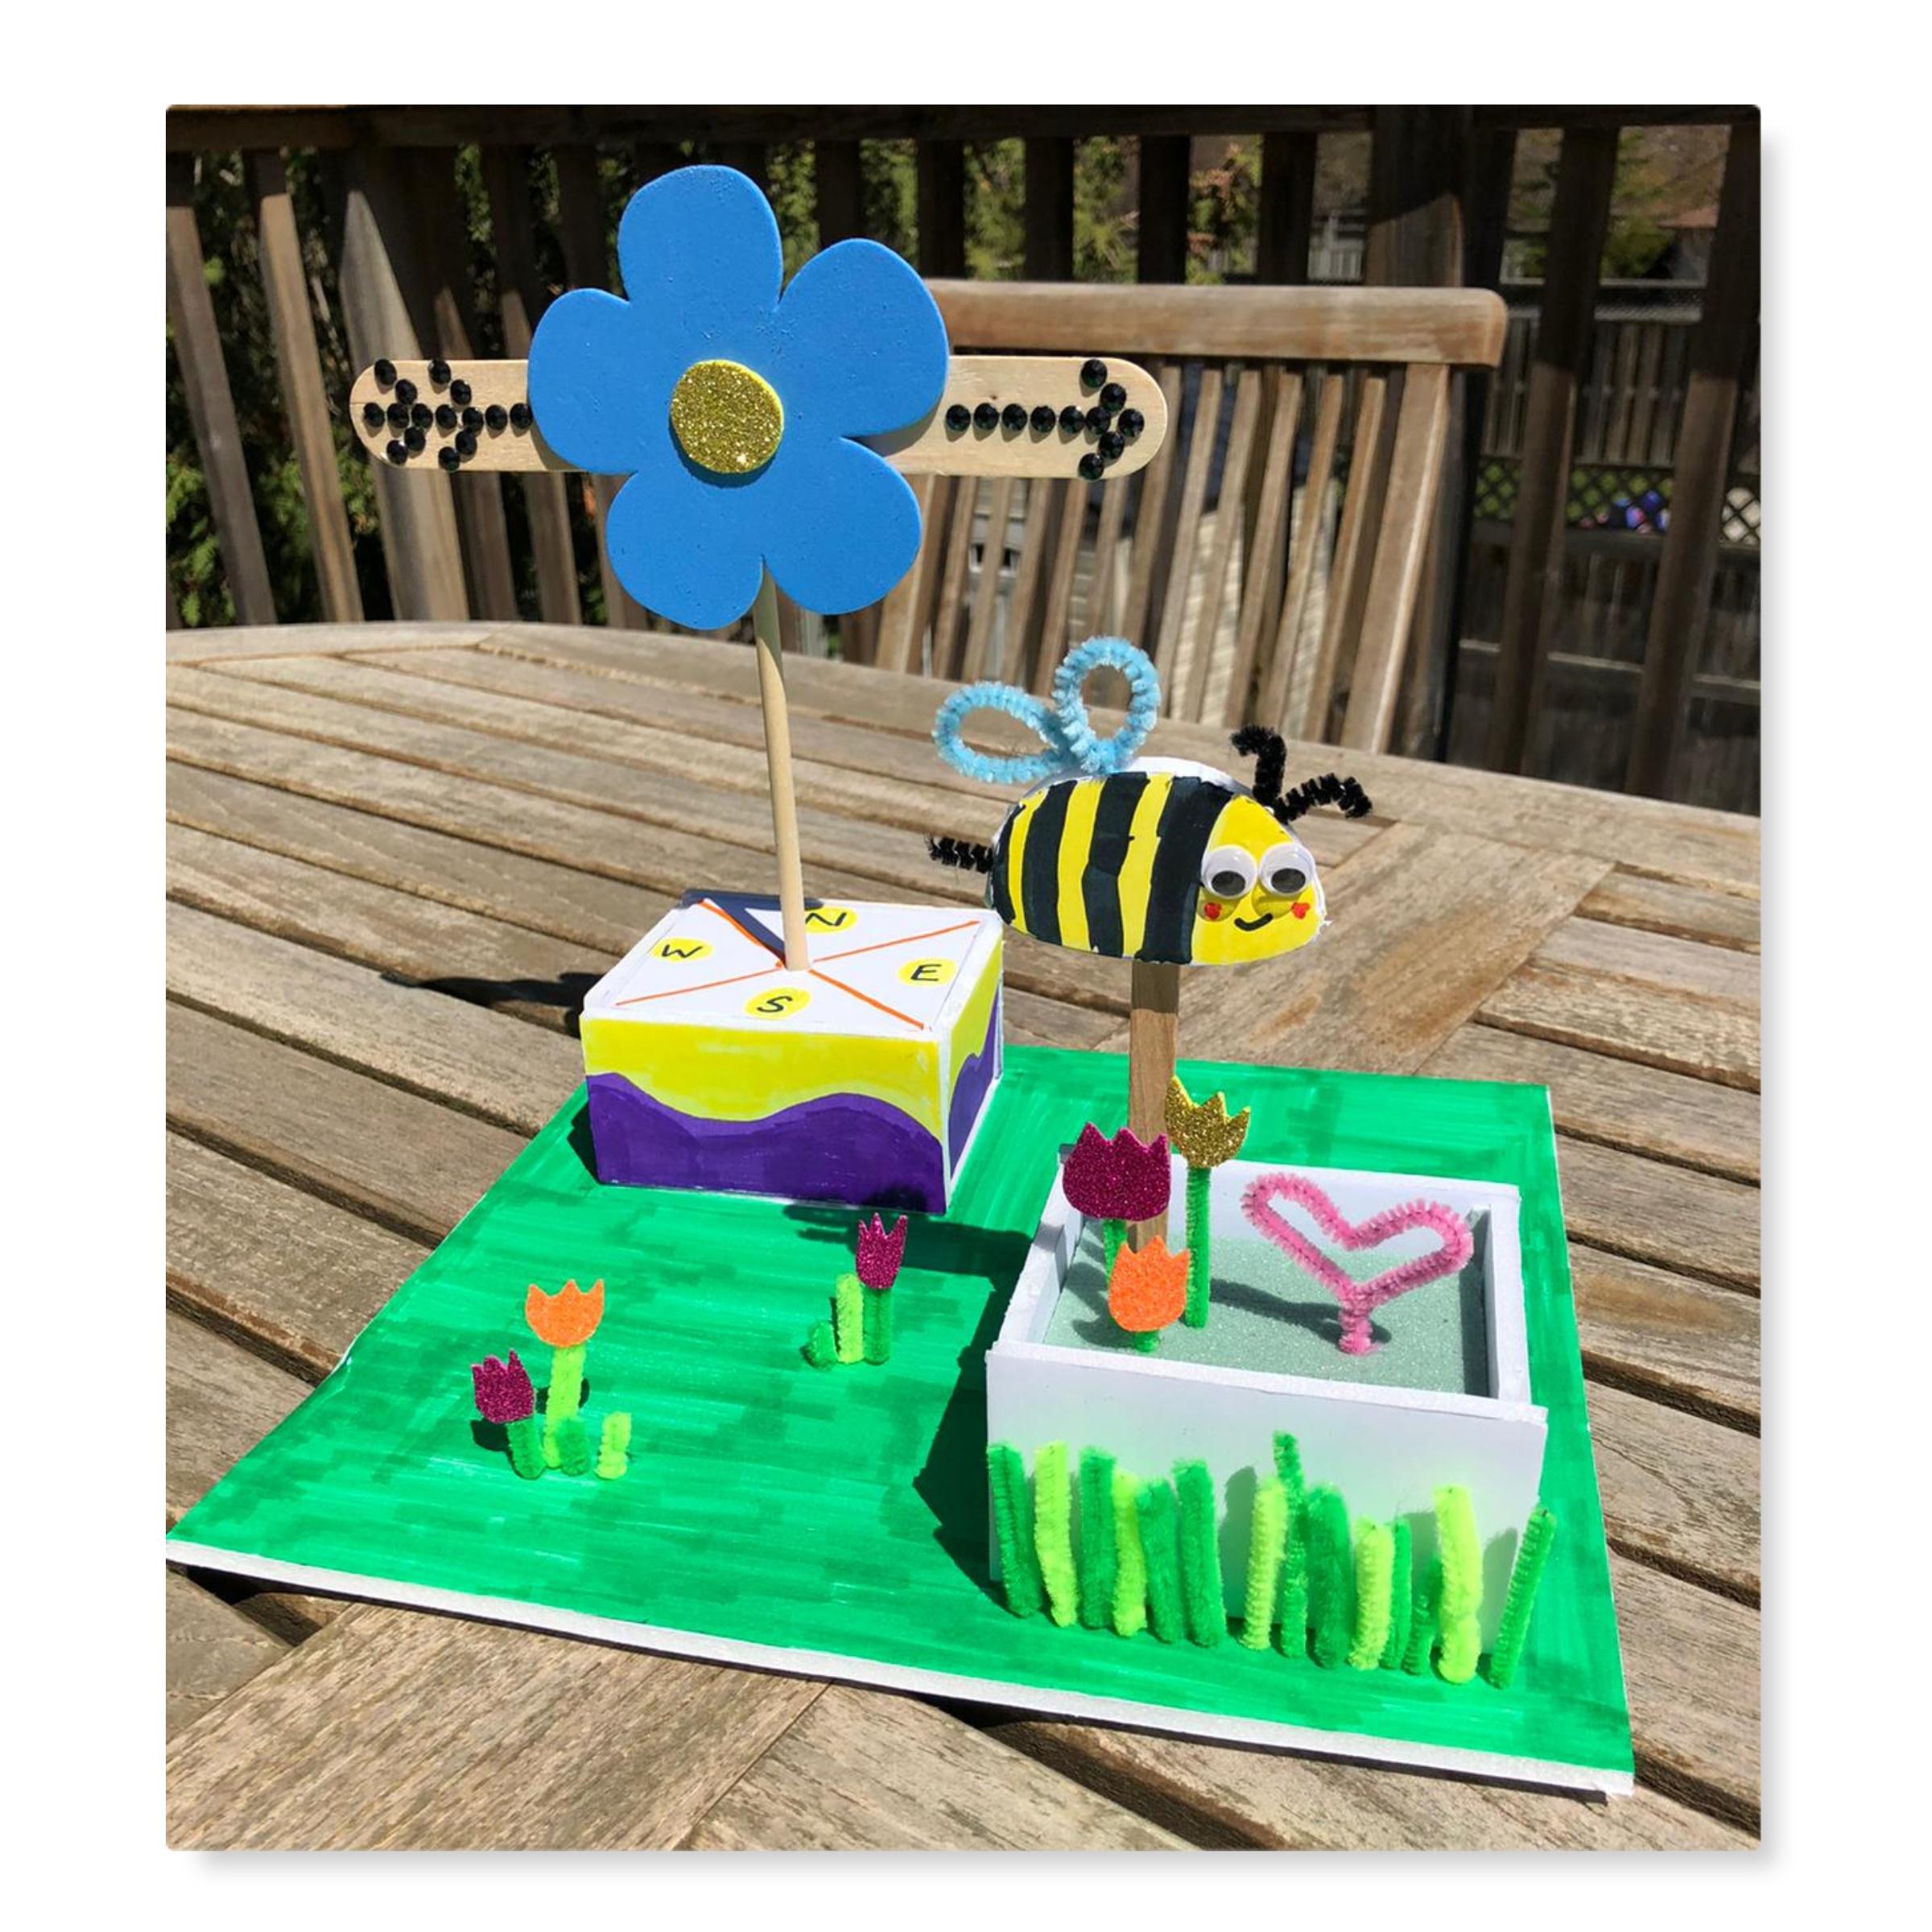 DIY Garden Weather Vane Craft Kit